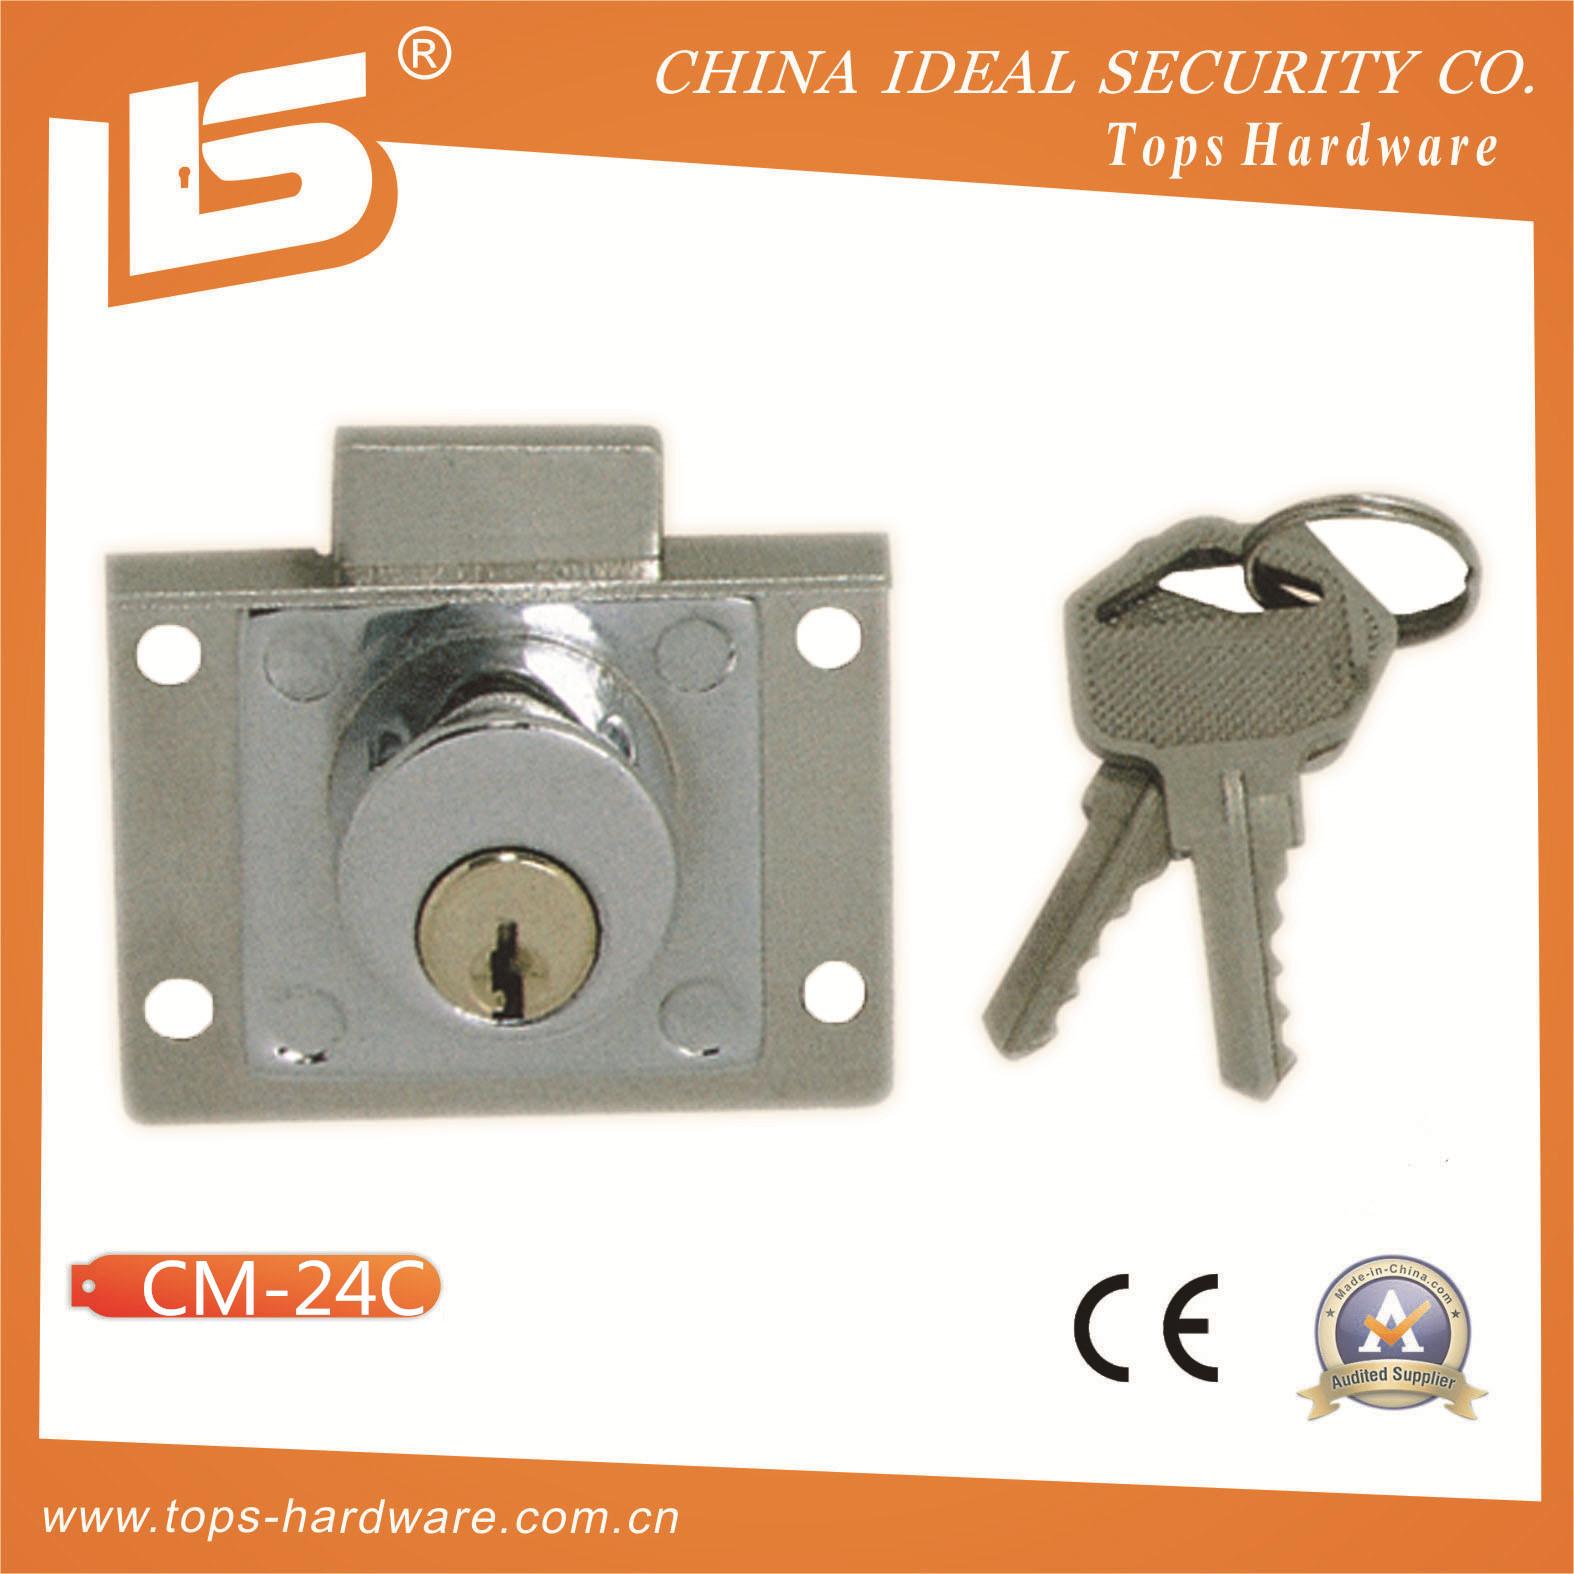 Zinc Furniture & Desk & Cabinet Drawer Lock (CM-24C)